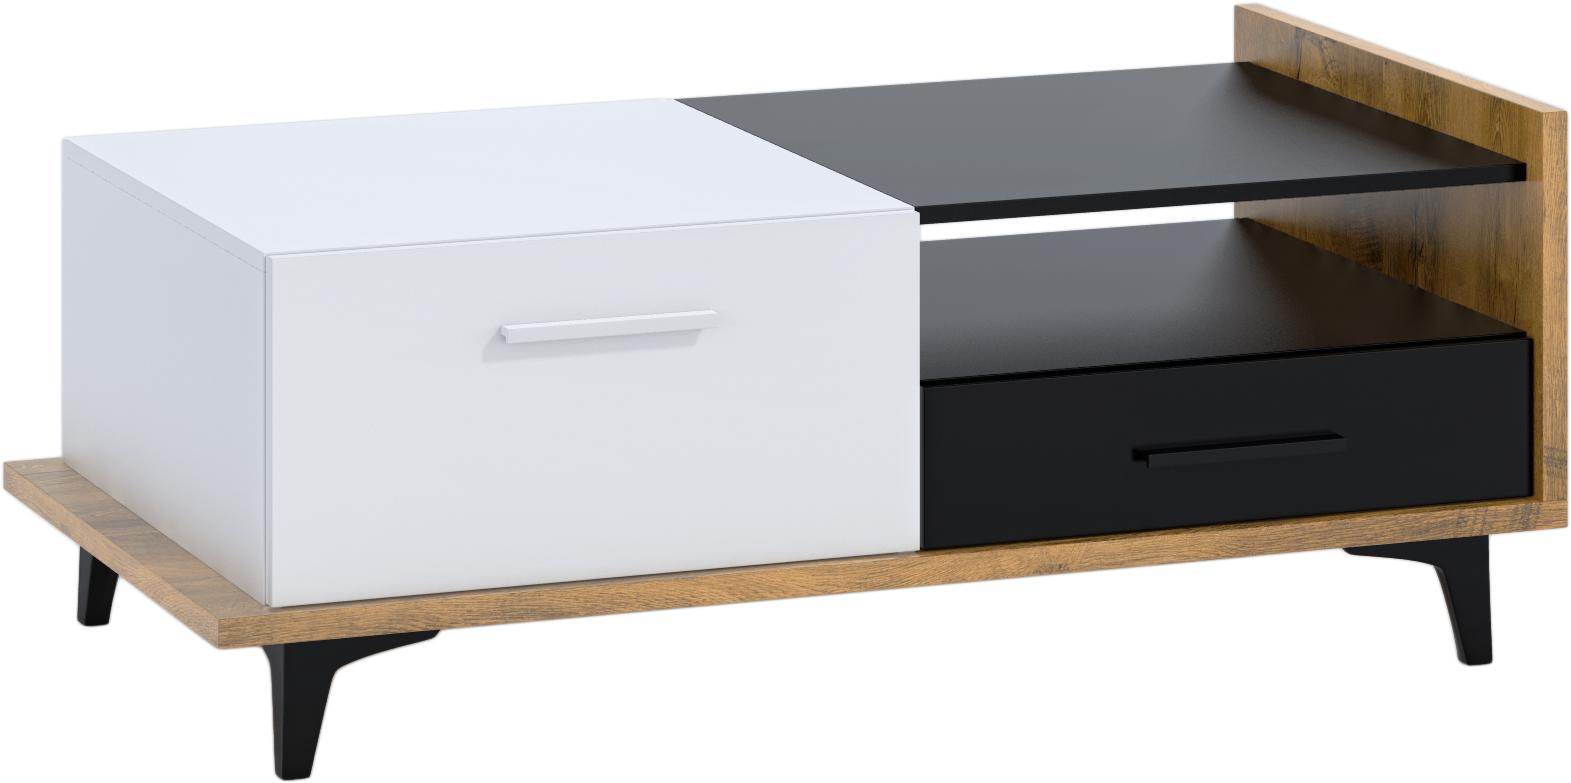 WIP Konferenčný stolík 2D2S BOX-03 Farba: dub burgun / biela / čierna